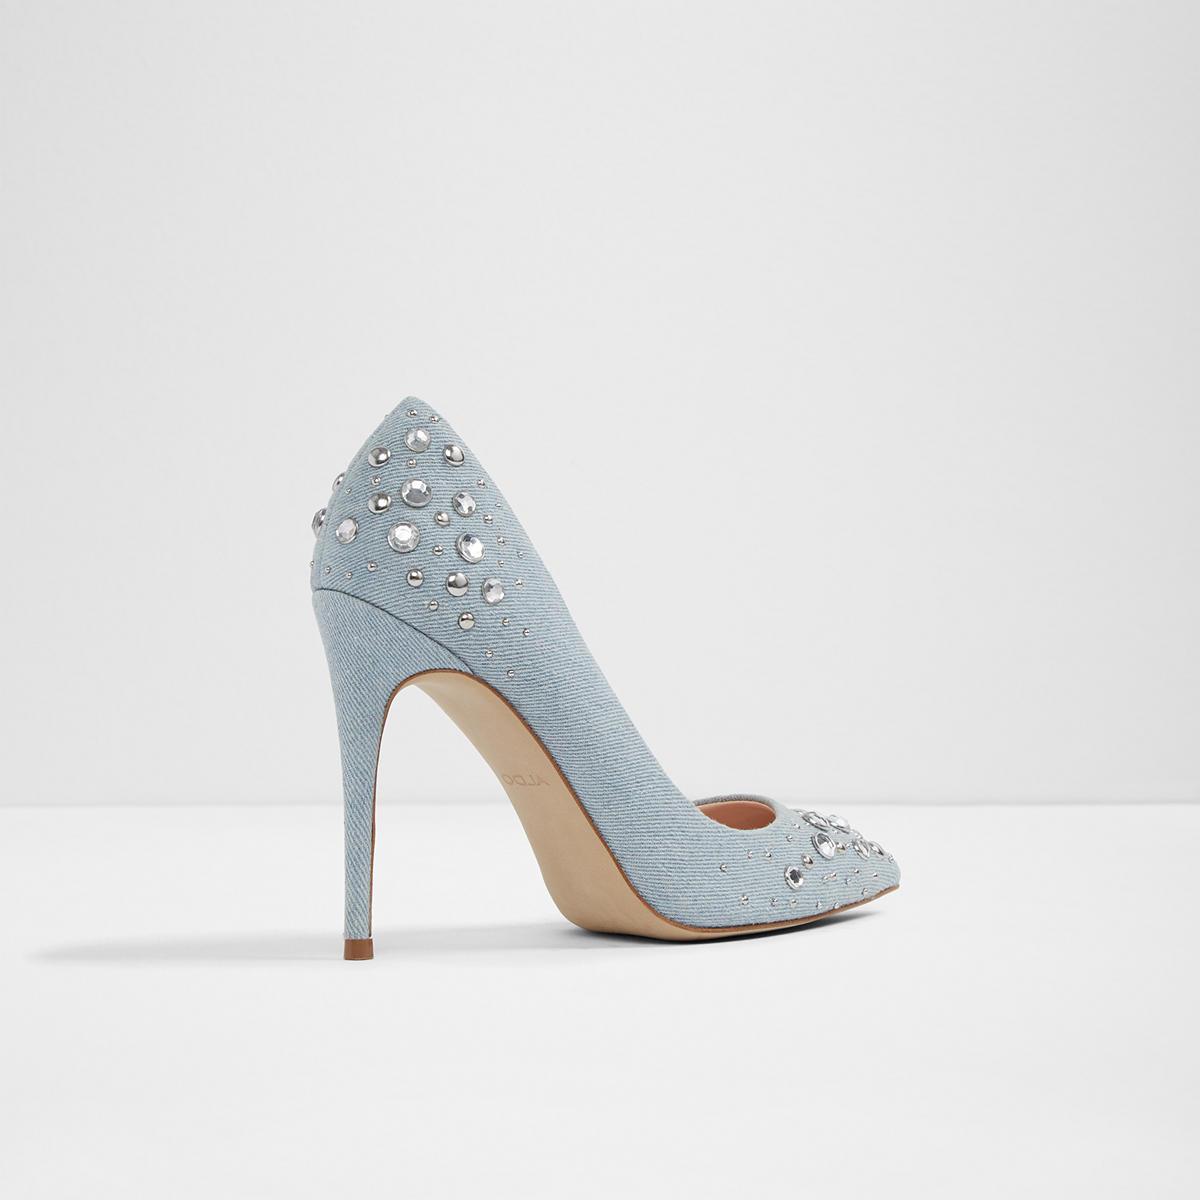 82069e4dc94 Aldo Shoes Jeweled Aldo Heels Size 9 Color Tan Size 9 in